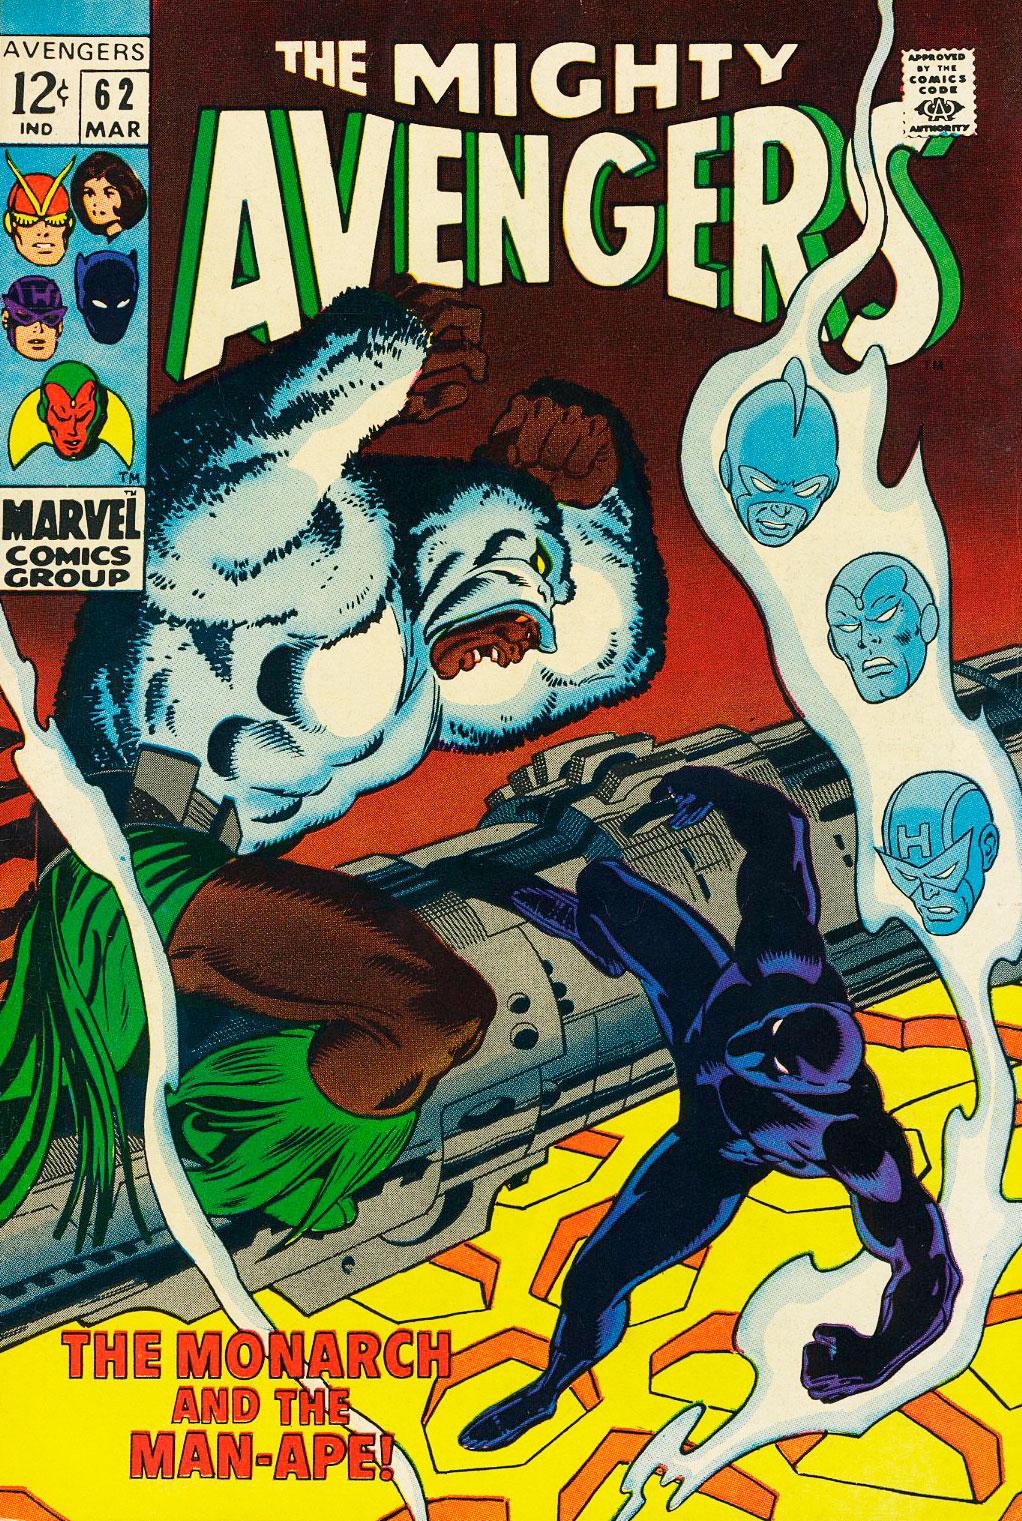 Avengers Vol 1 #62